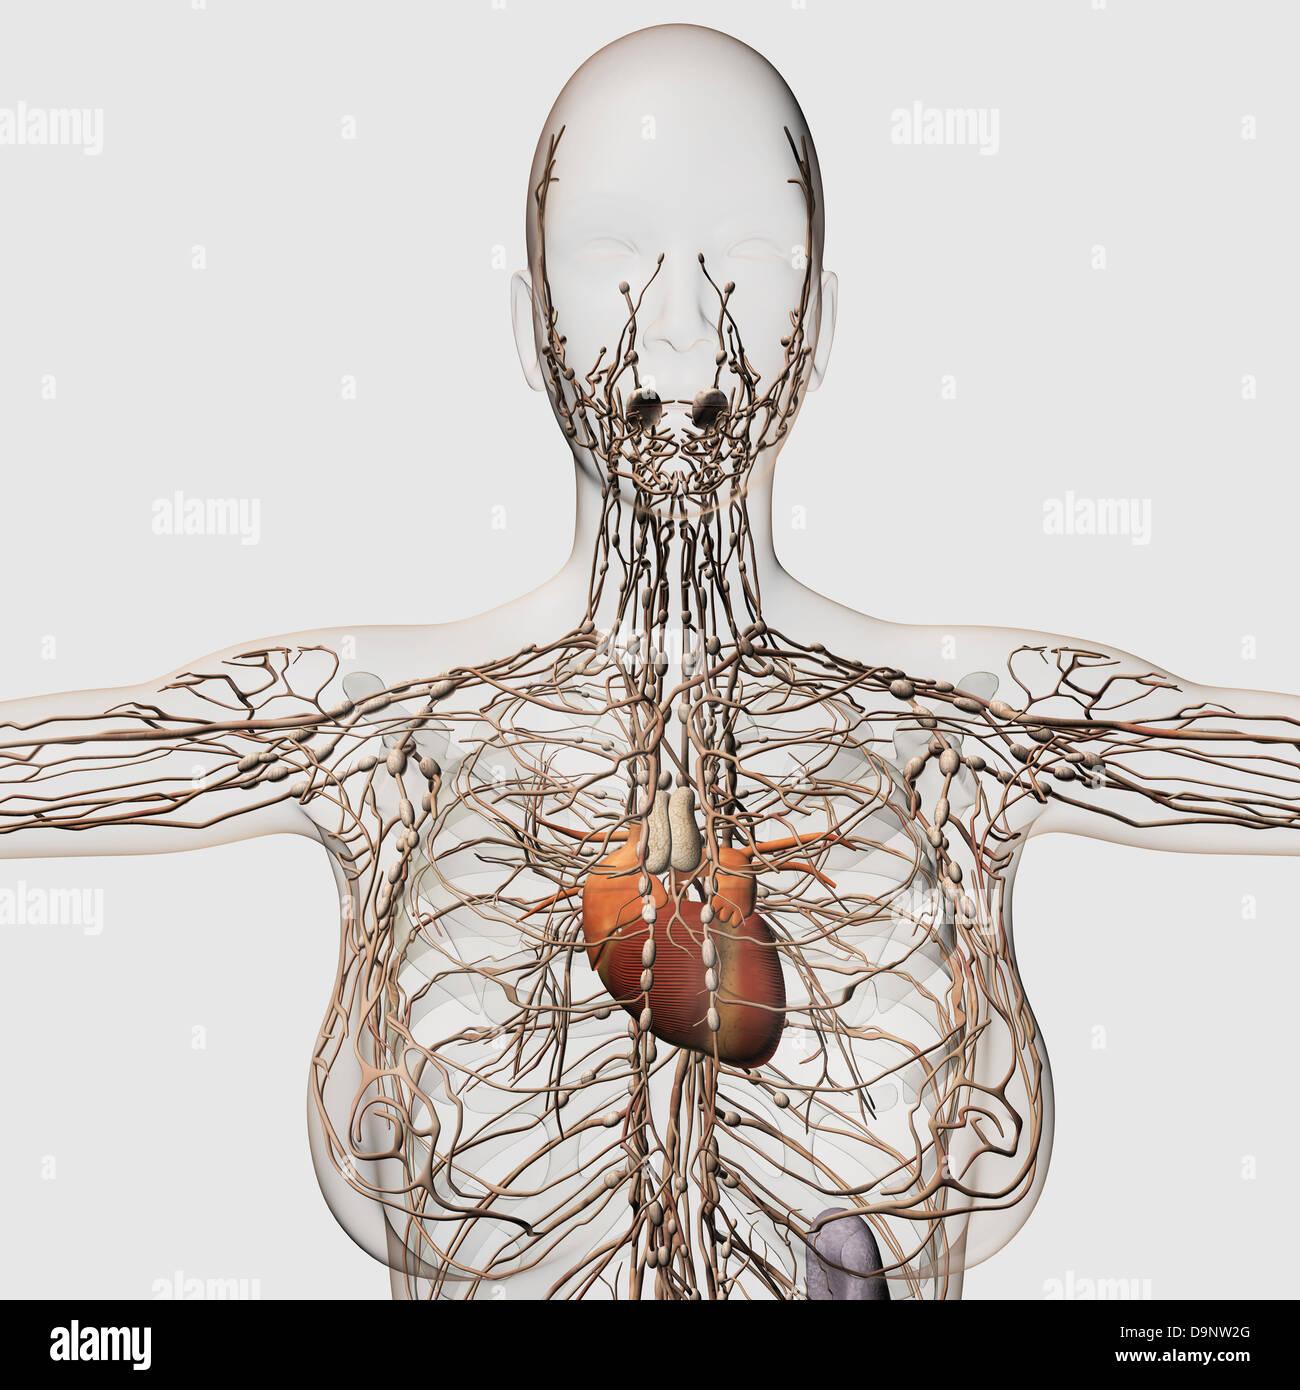 Female Lymphatic System Stockfotos & Female Lymphatic System Bilder ...